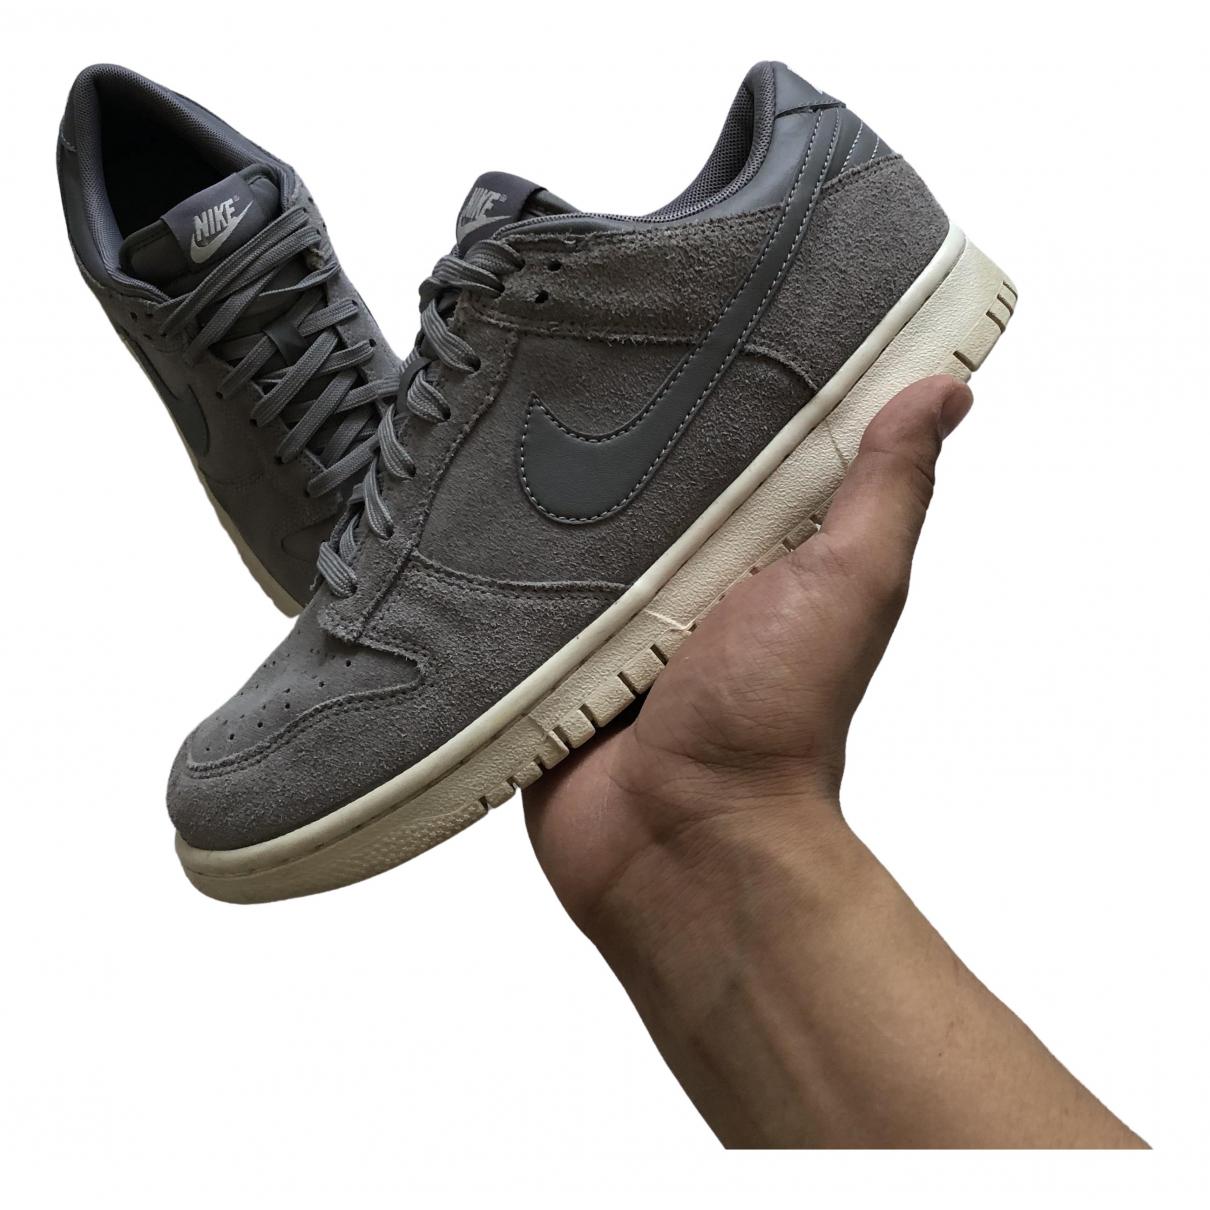 Nike \N Grey Suede Trainers for Men 41 EU